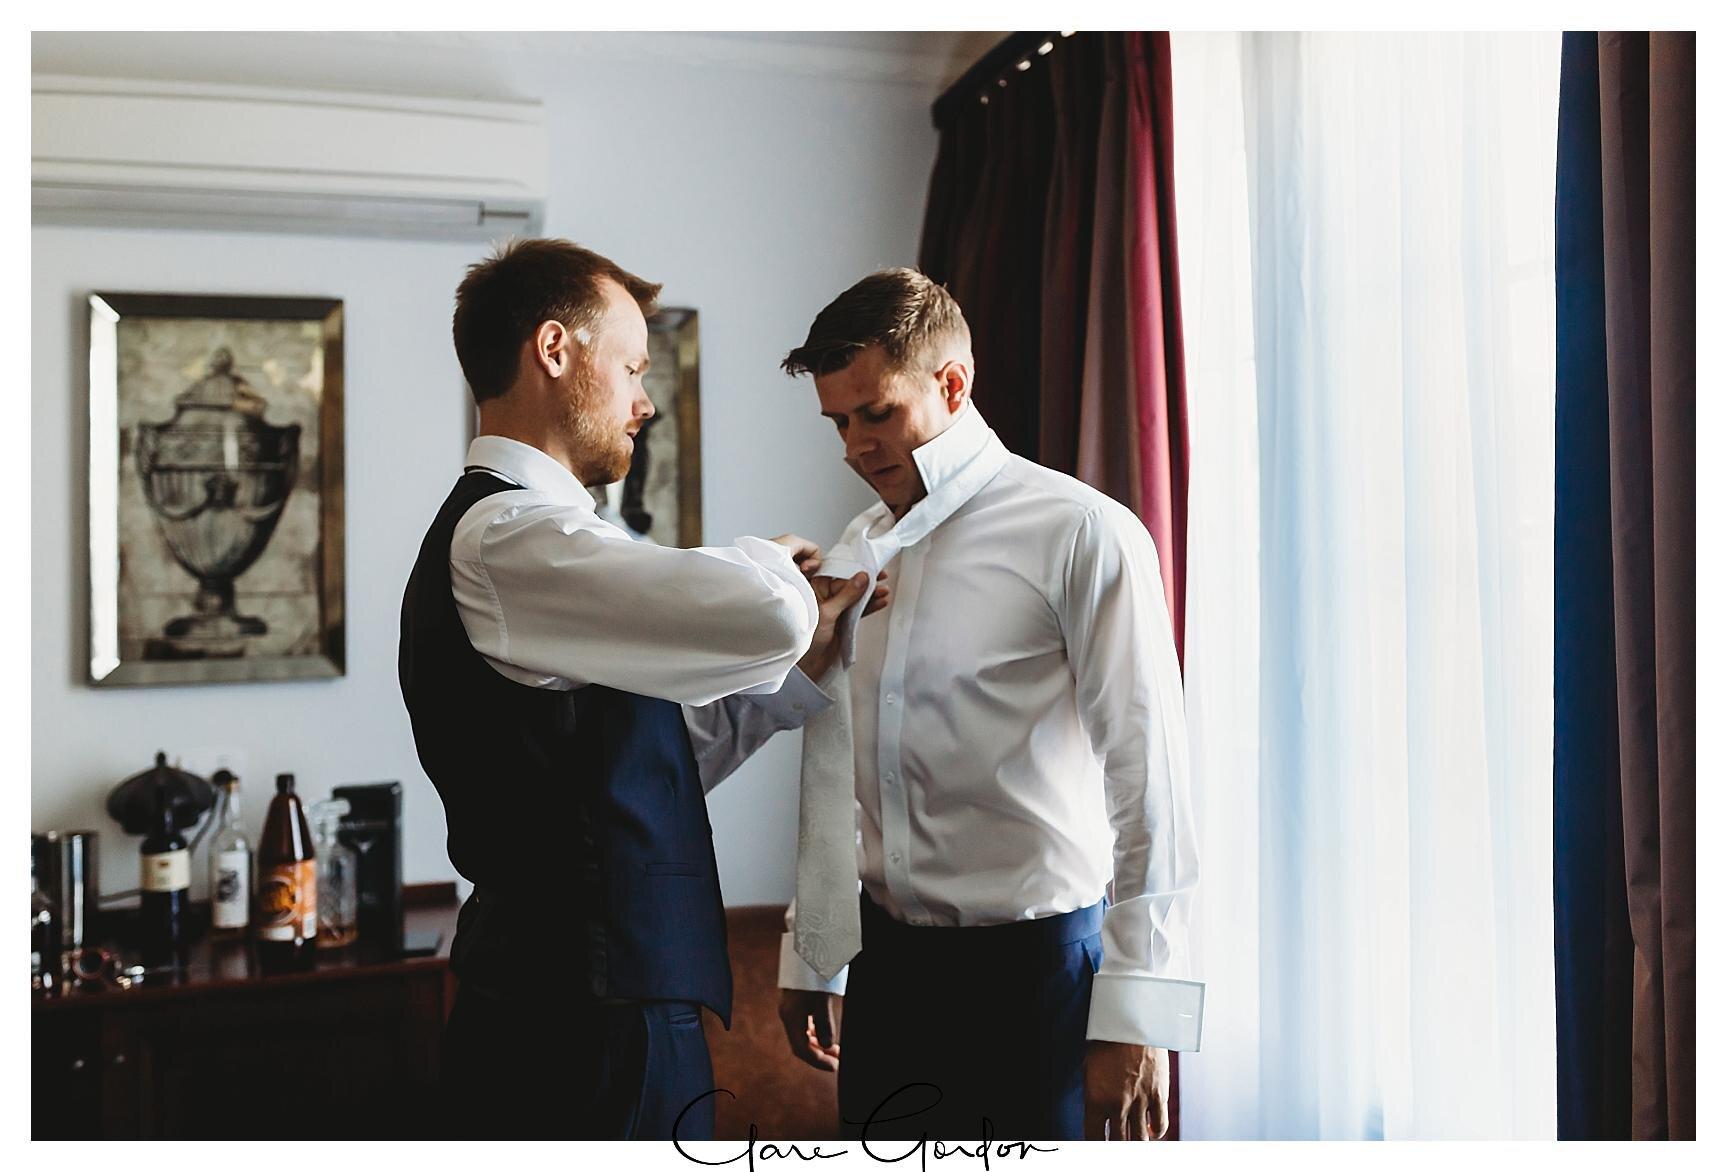 Henley-Hotel-Cherry-blossom-wedding-photos (9).jpg